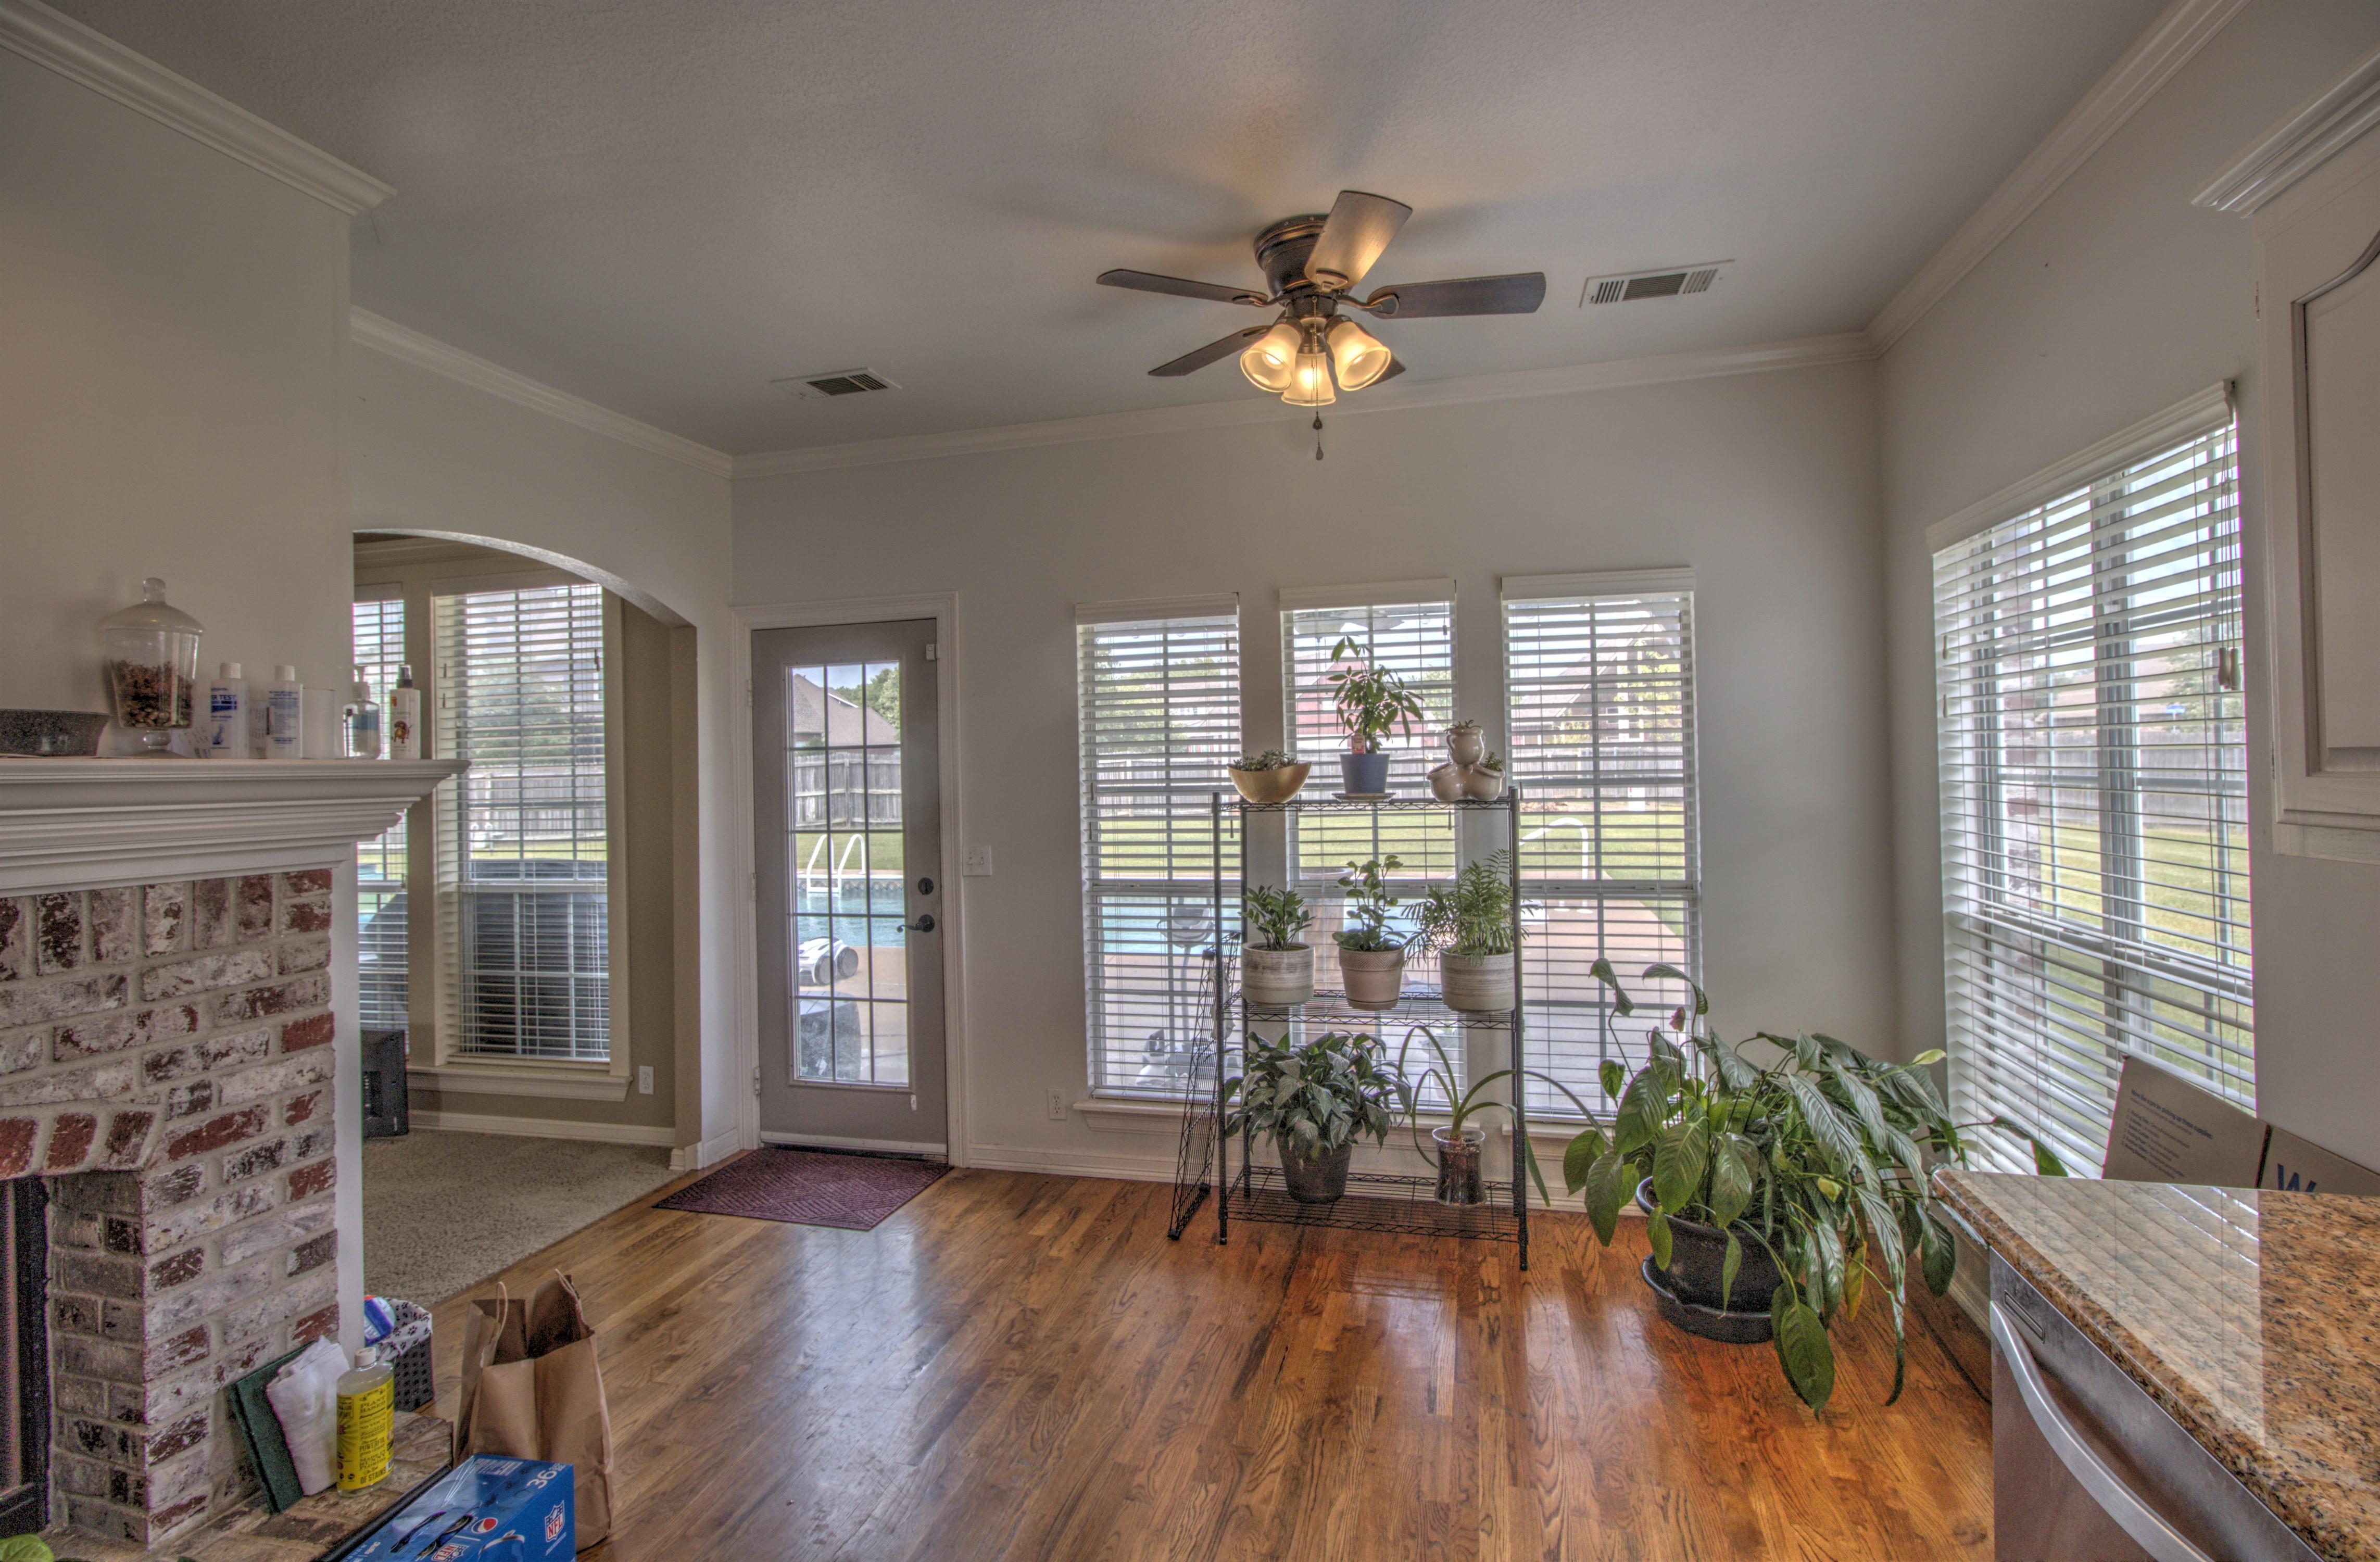 9021 N 137th East Avenue Property Photo 16